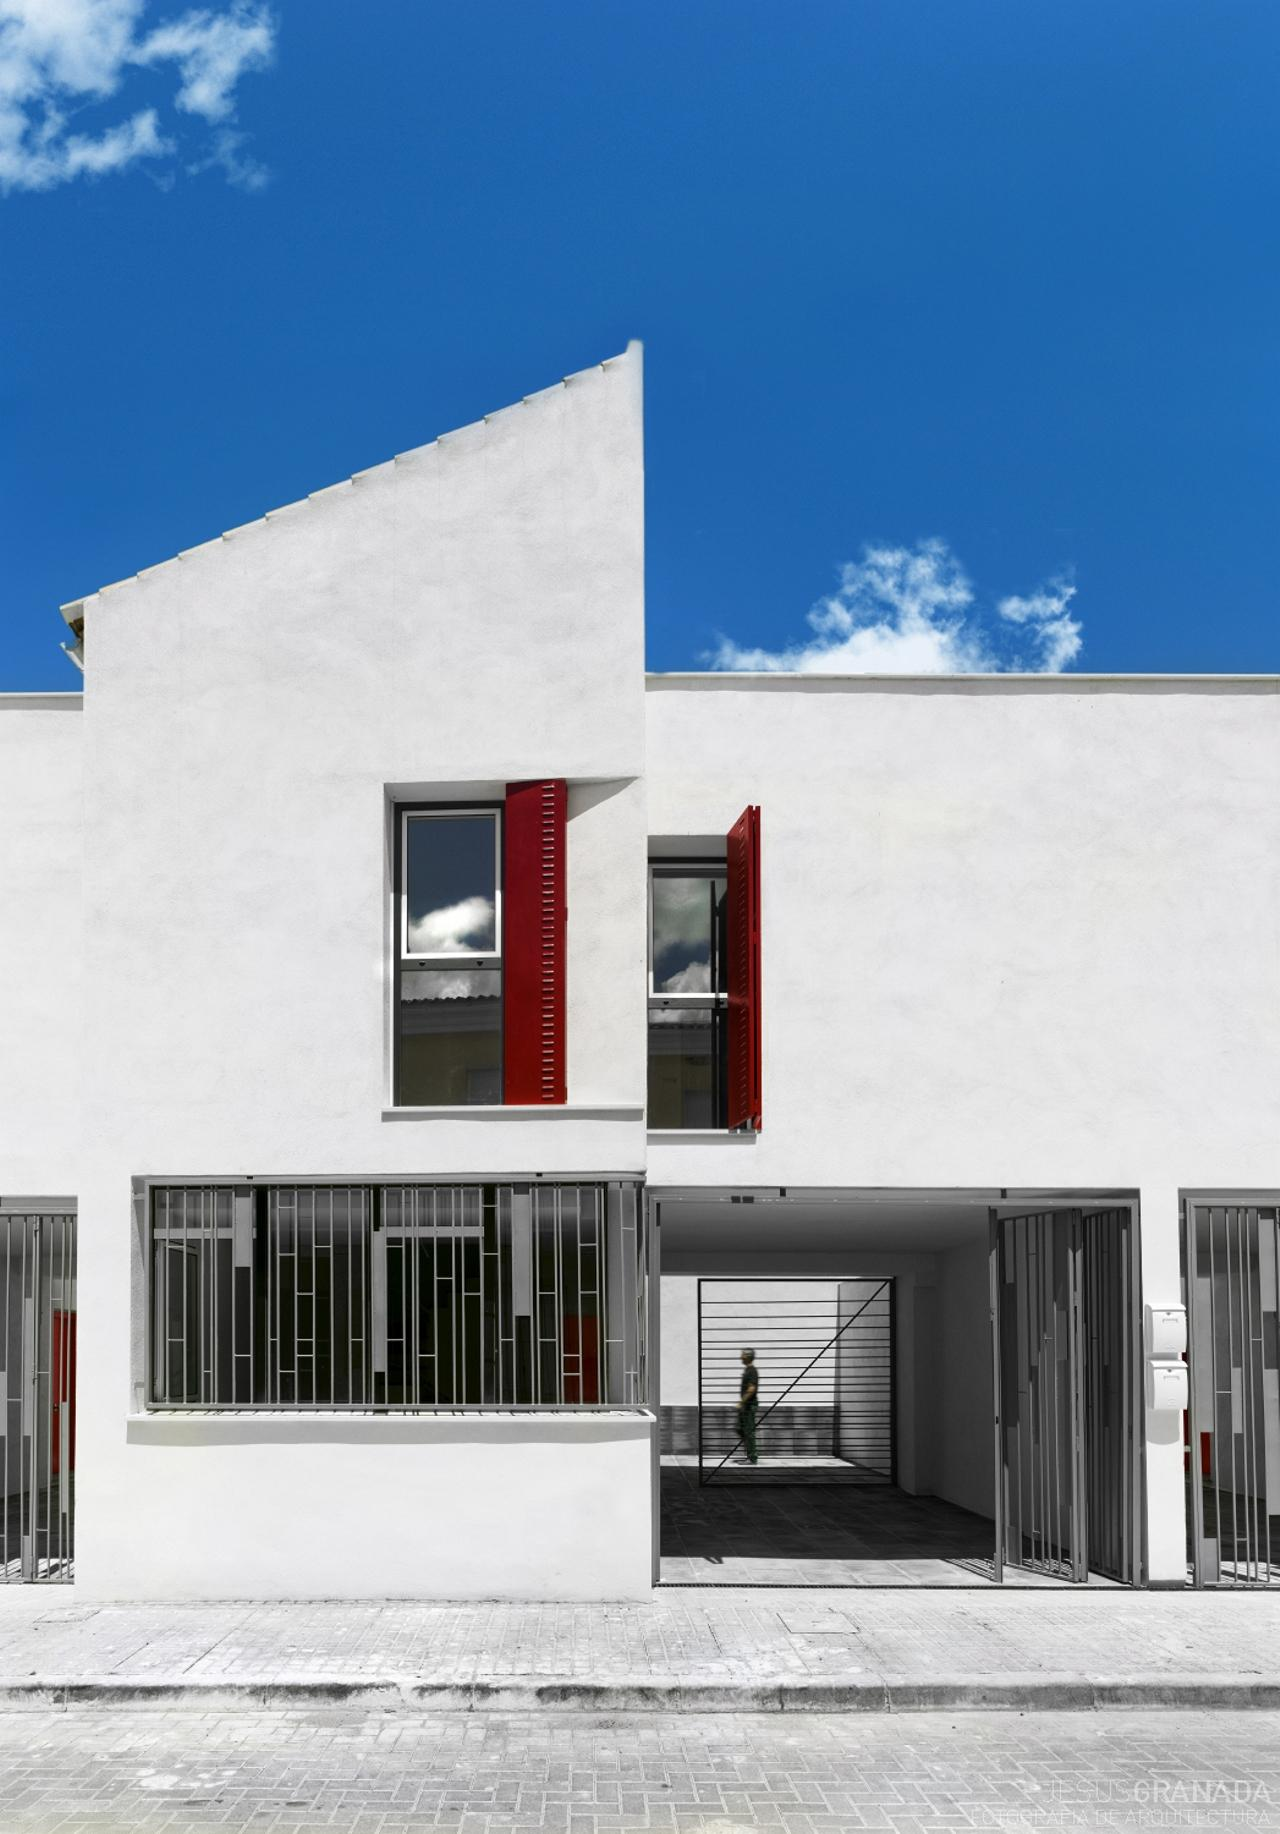 CORDOVA SOCIAL HOUSING 10